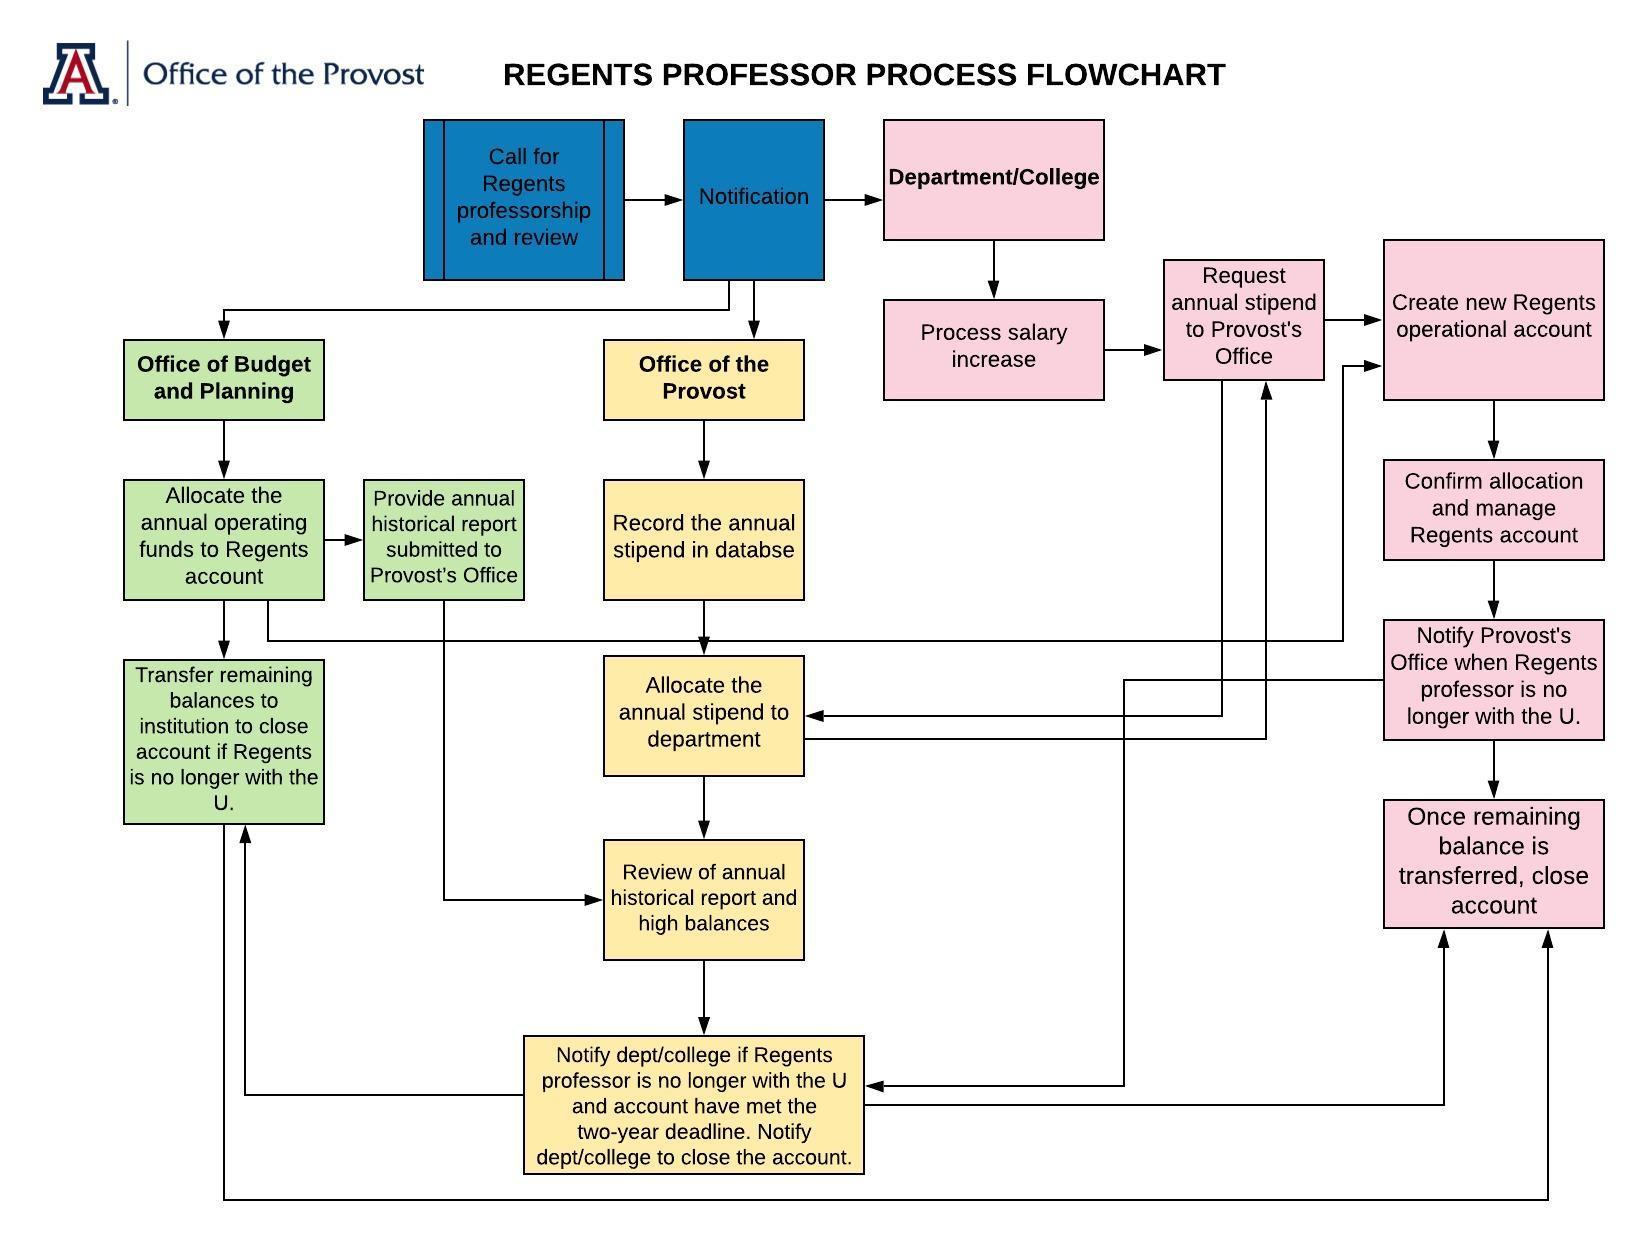 Regent Professor Process Flowchart